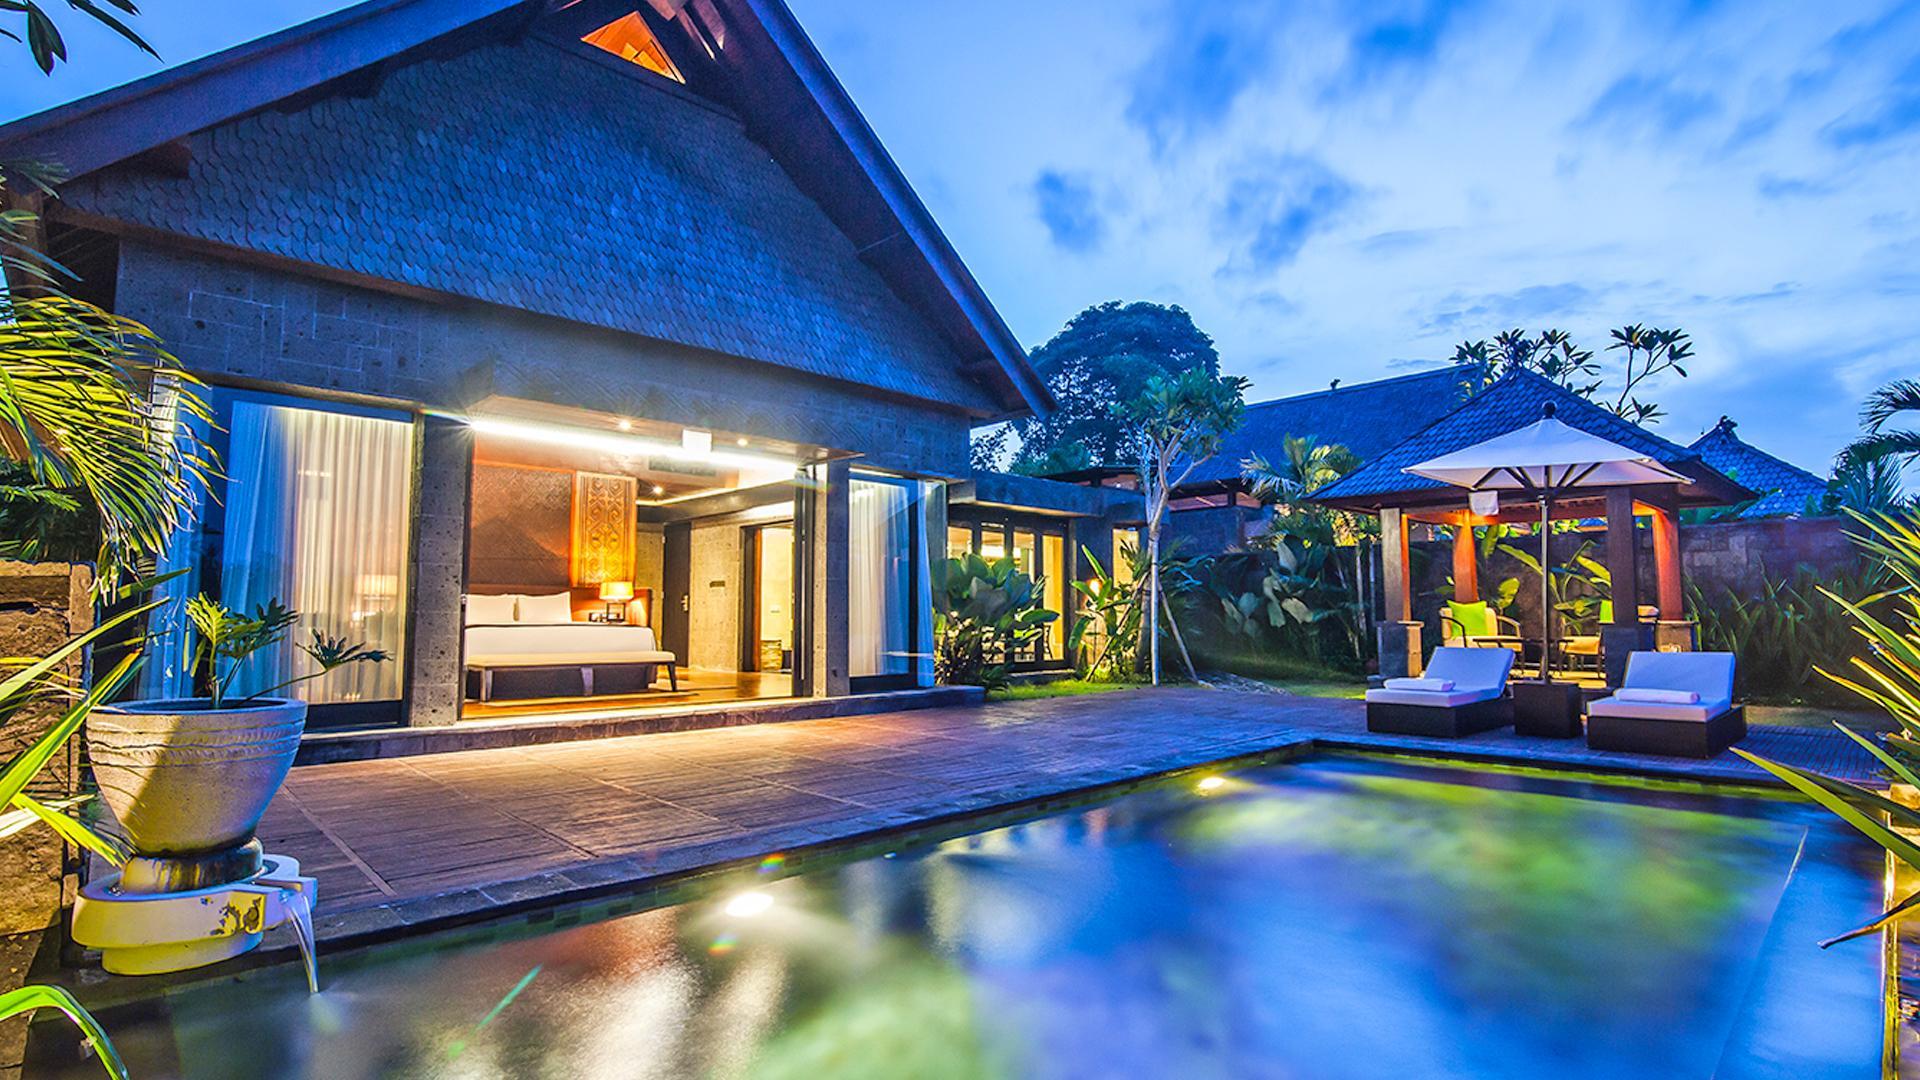 One Bedroom Garden Pool Villa image 1 at Sanctoo Suites & Villas by Kabupaten Gianyar, Bali, Indonesia